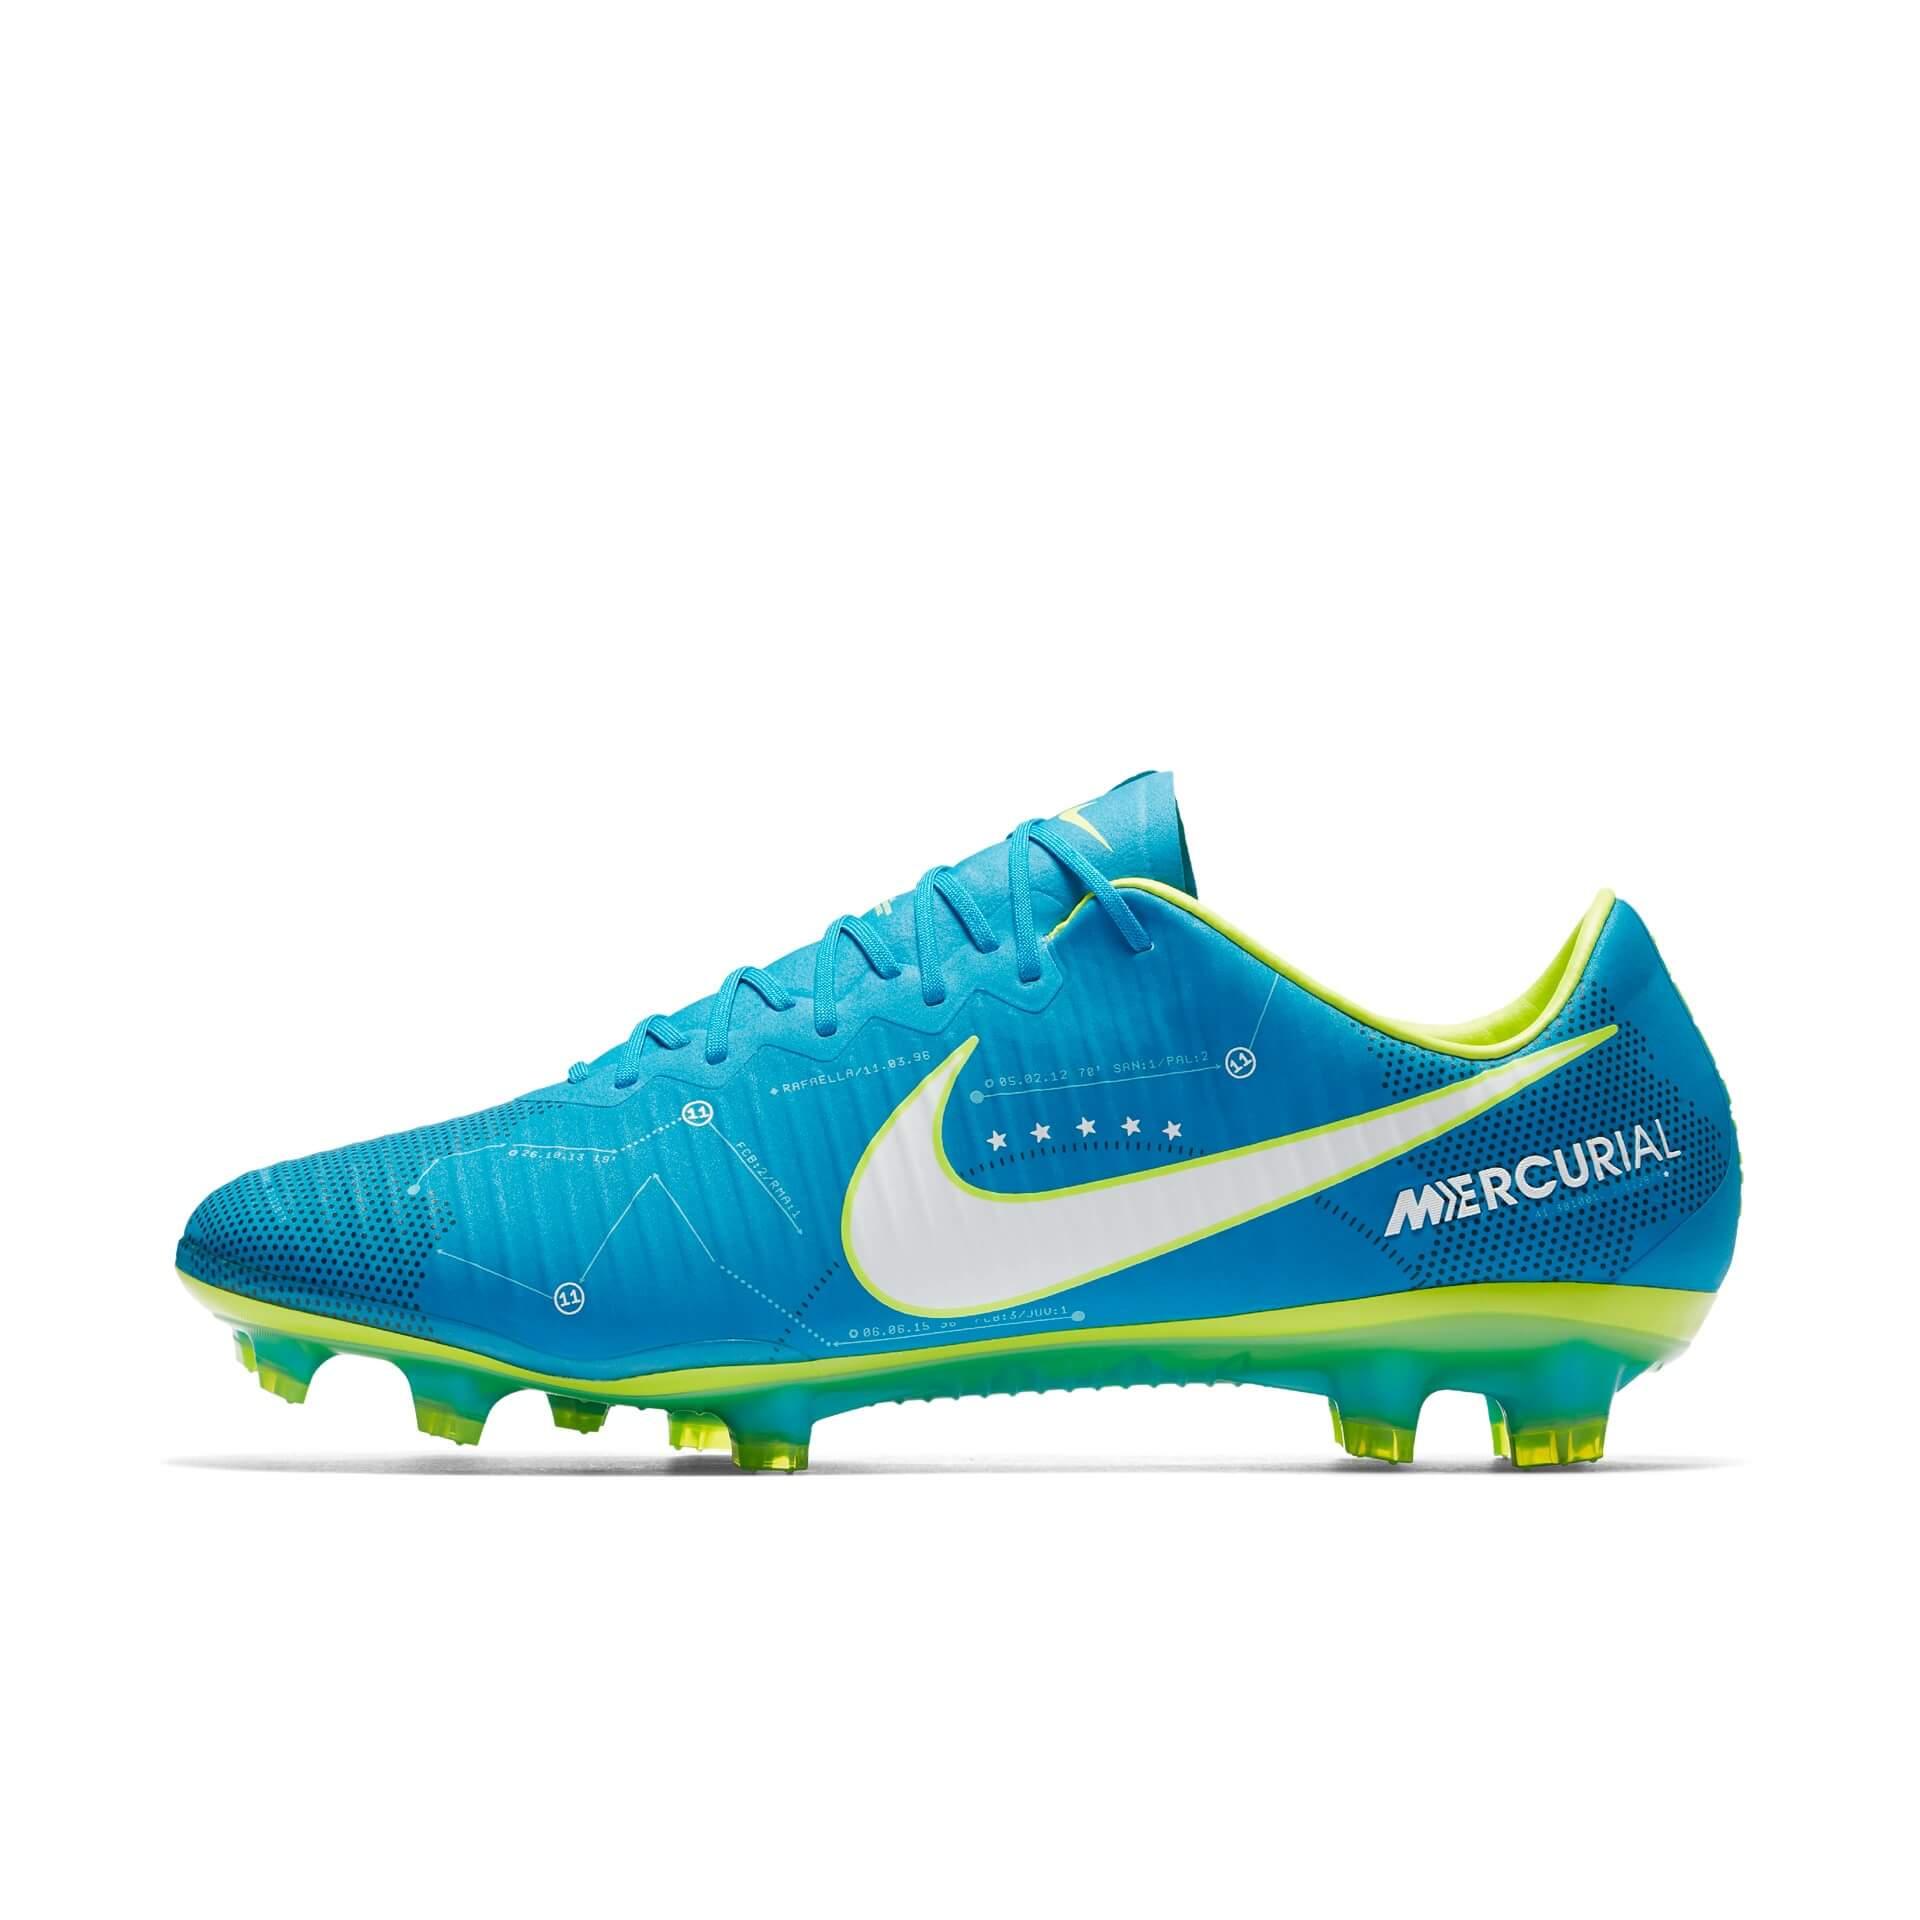 Football Factor - Neymar 5b16c4ce11